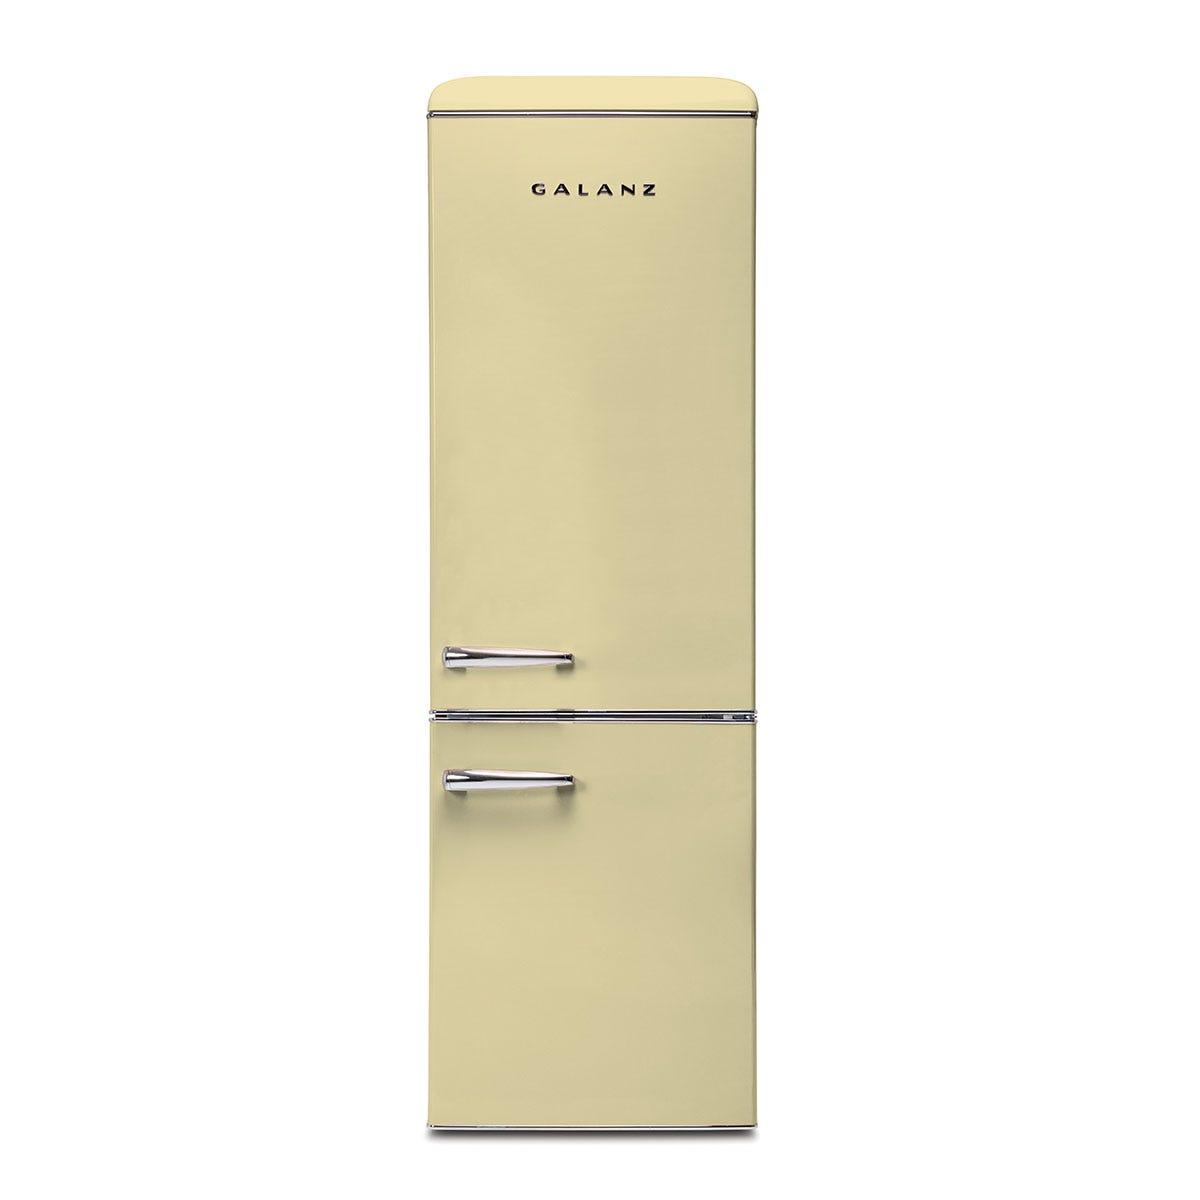 Galanz RFFK002C 300L Freestanding Retro Fridge Freezer - Cream